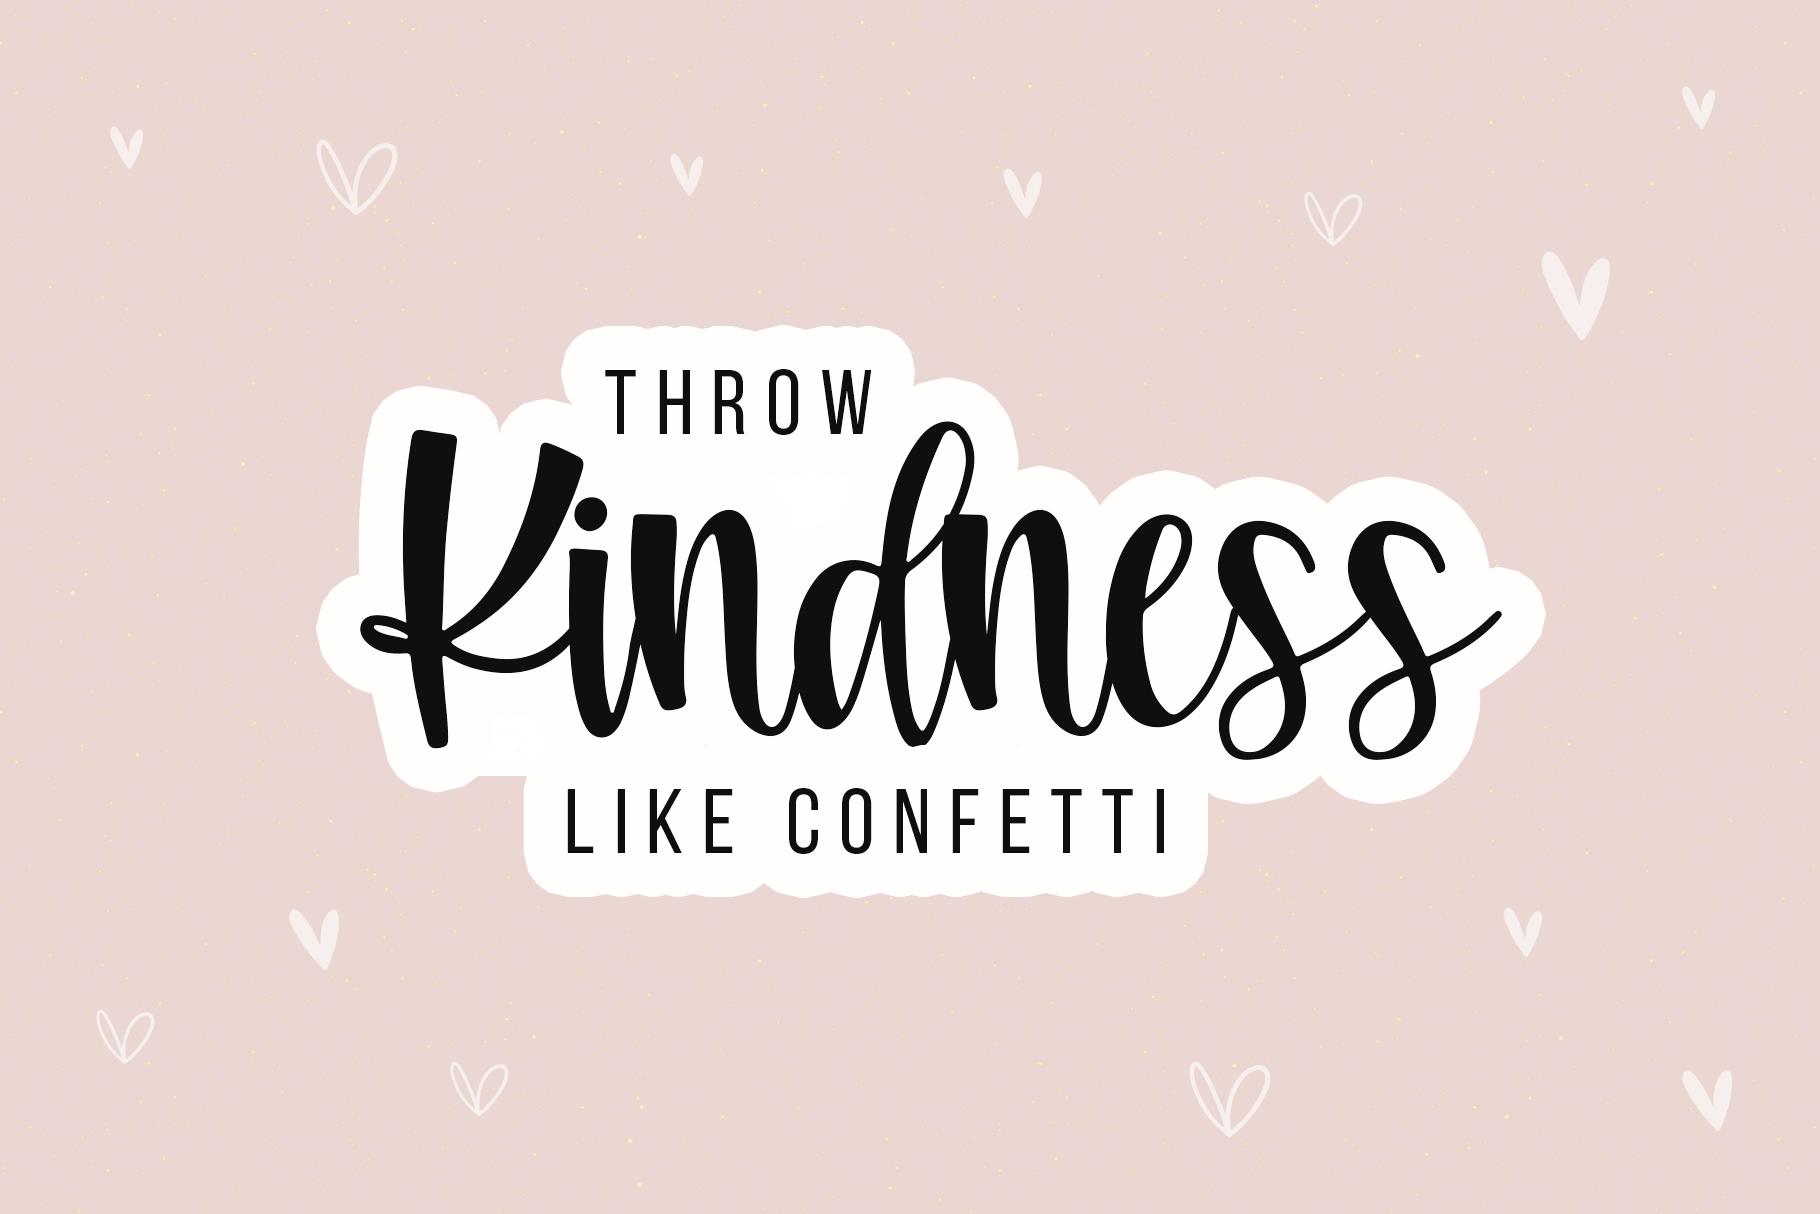 Heartwarming - A Bouncy Handwritten Script Font example image 4